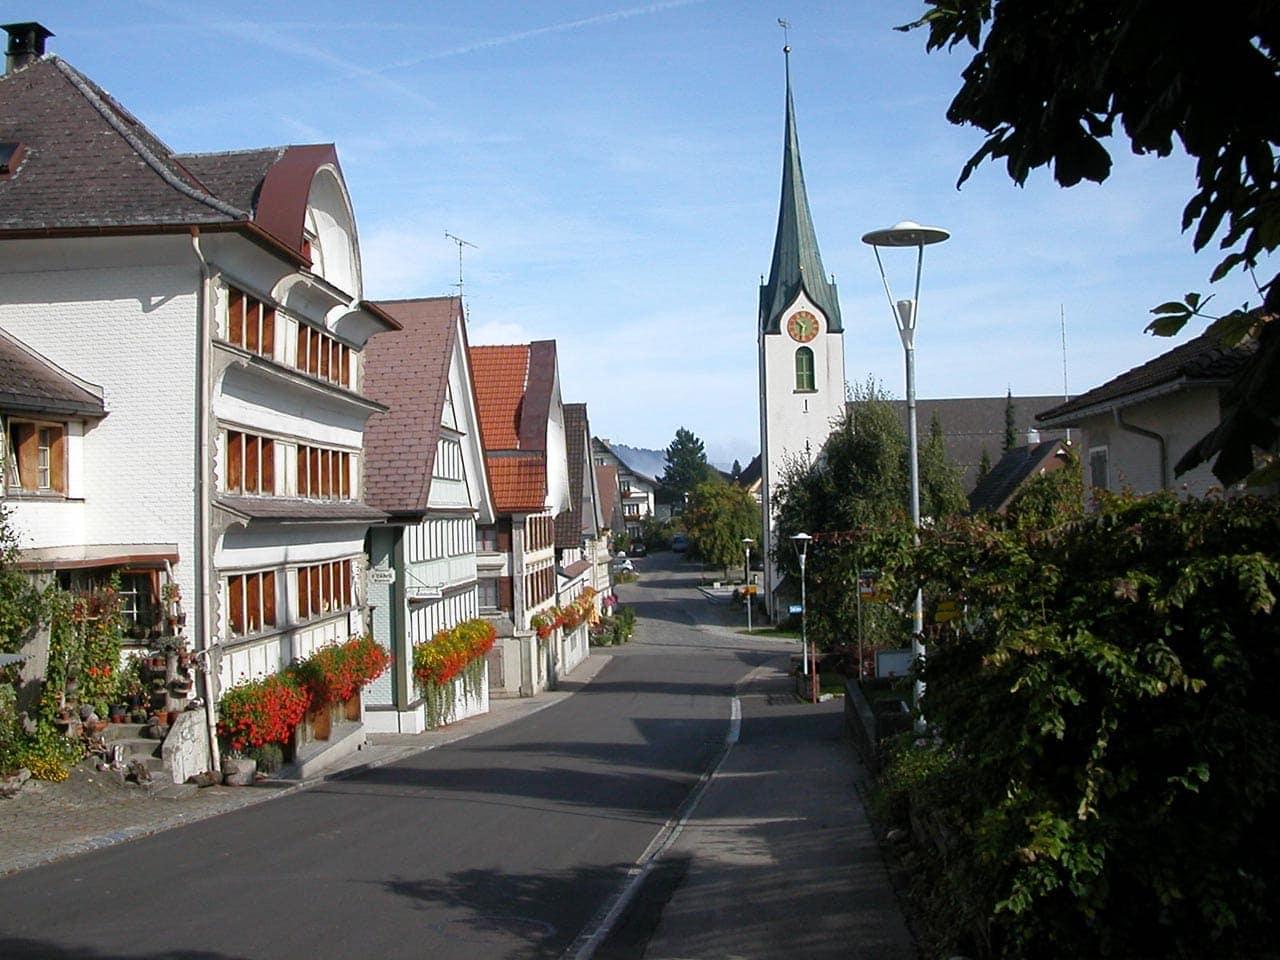 Hemberg – Dorfbild von nationaler Bedeutung